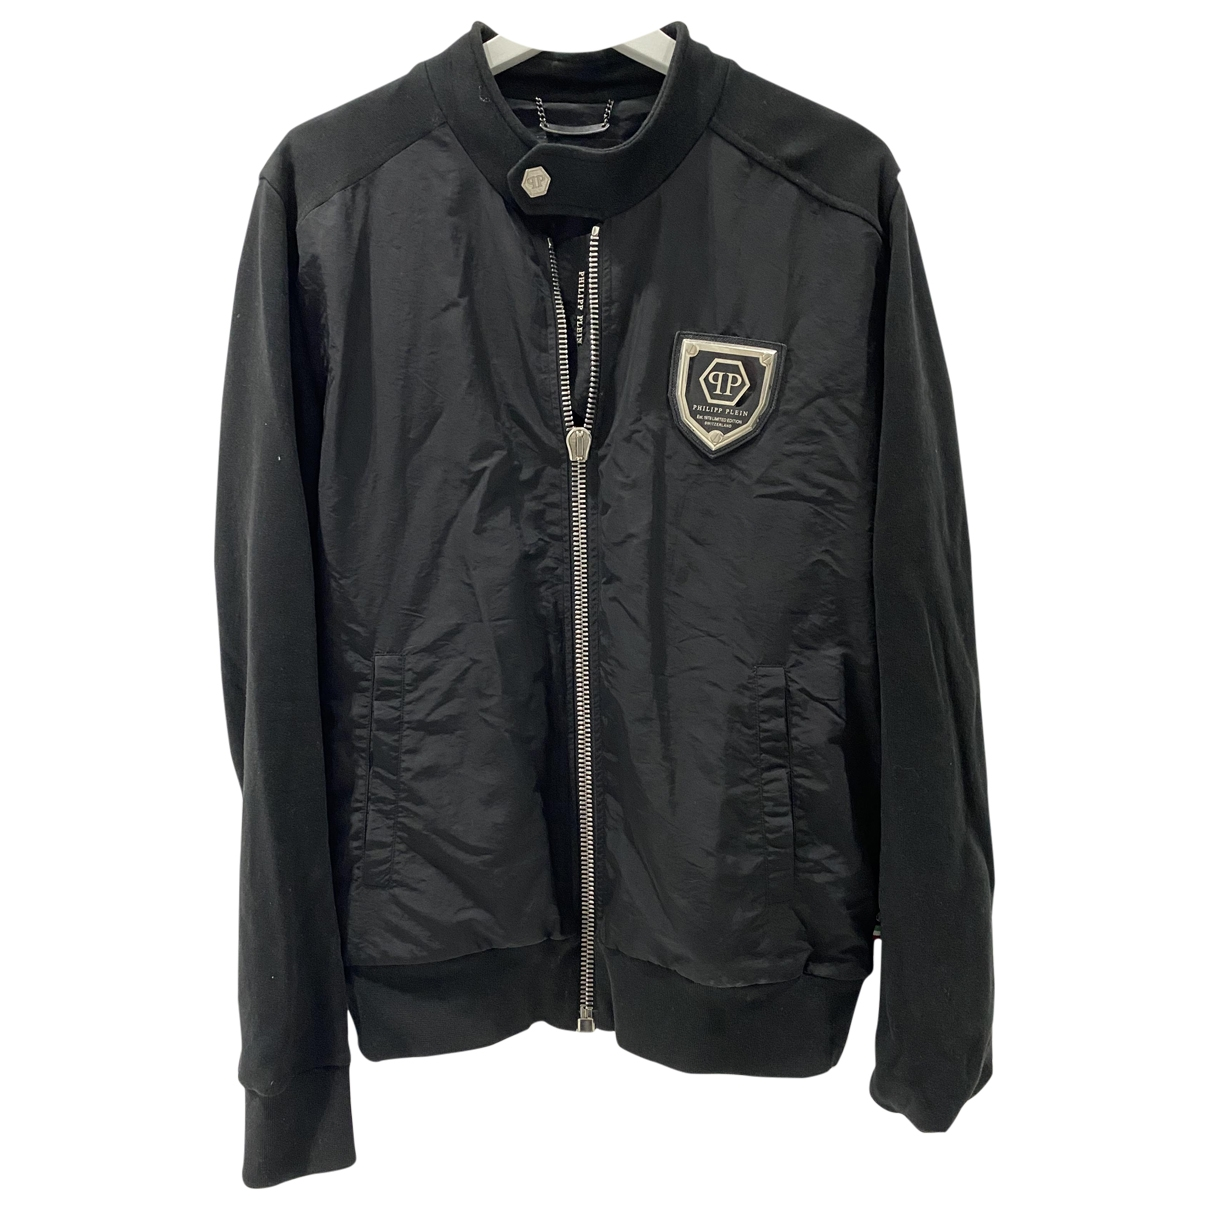 Philipp Plein \N Black Cotton jacket  for Men L International